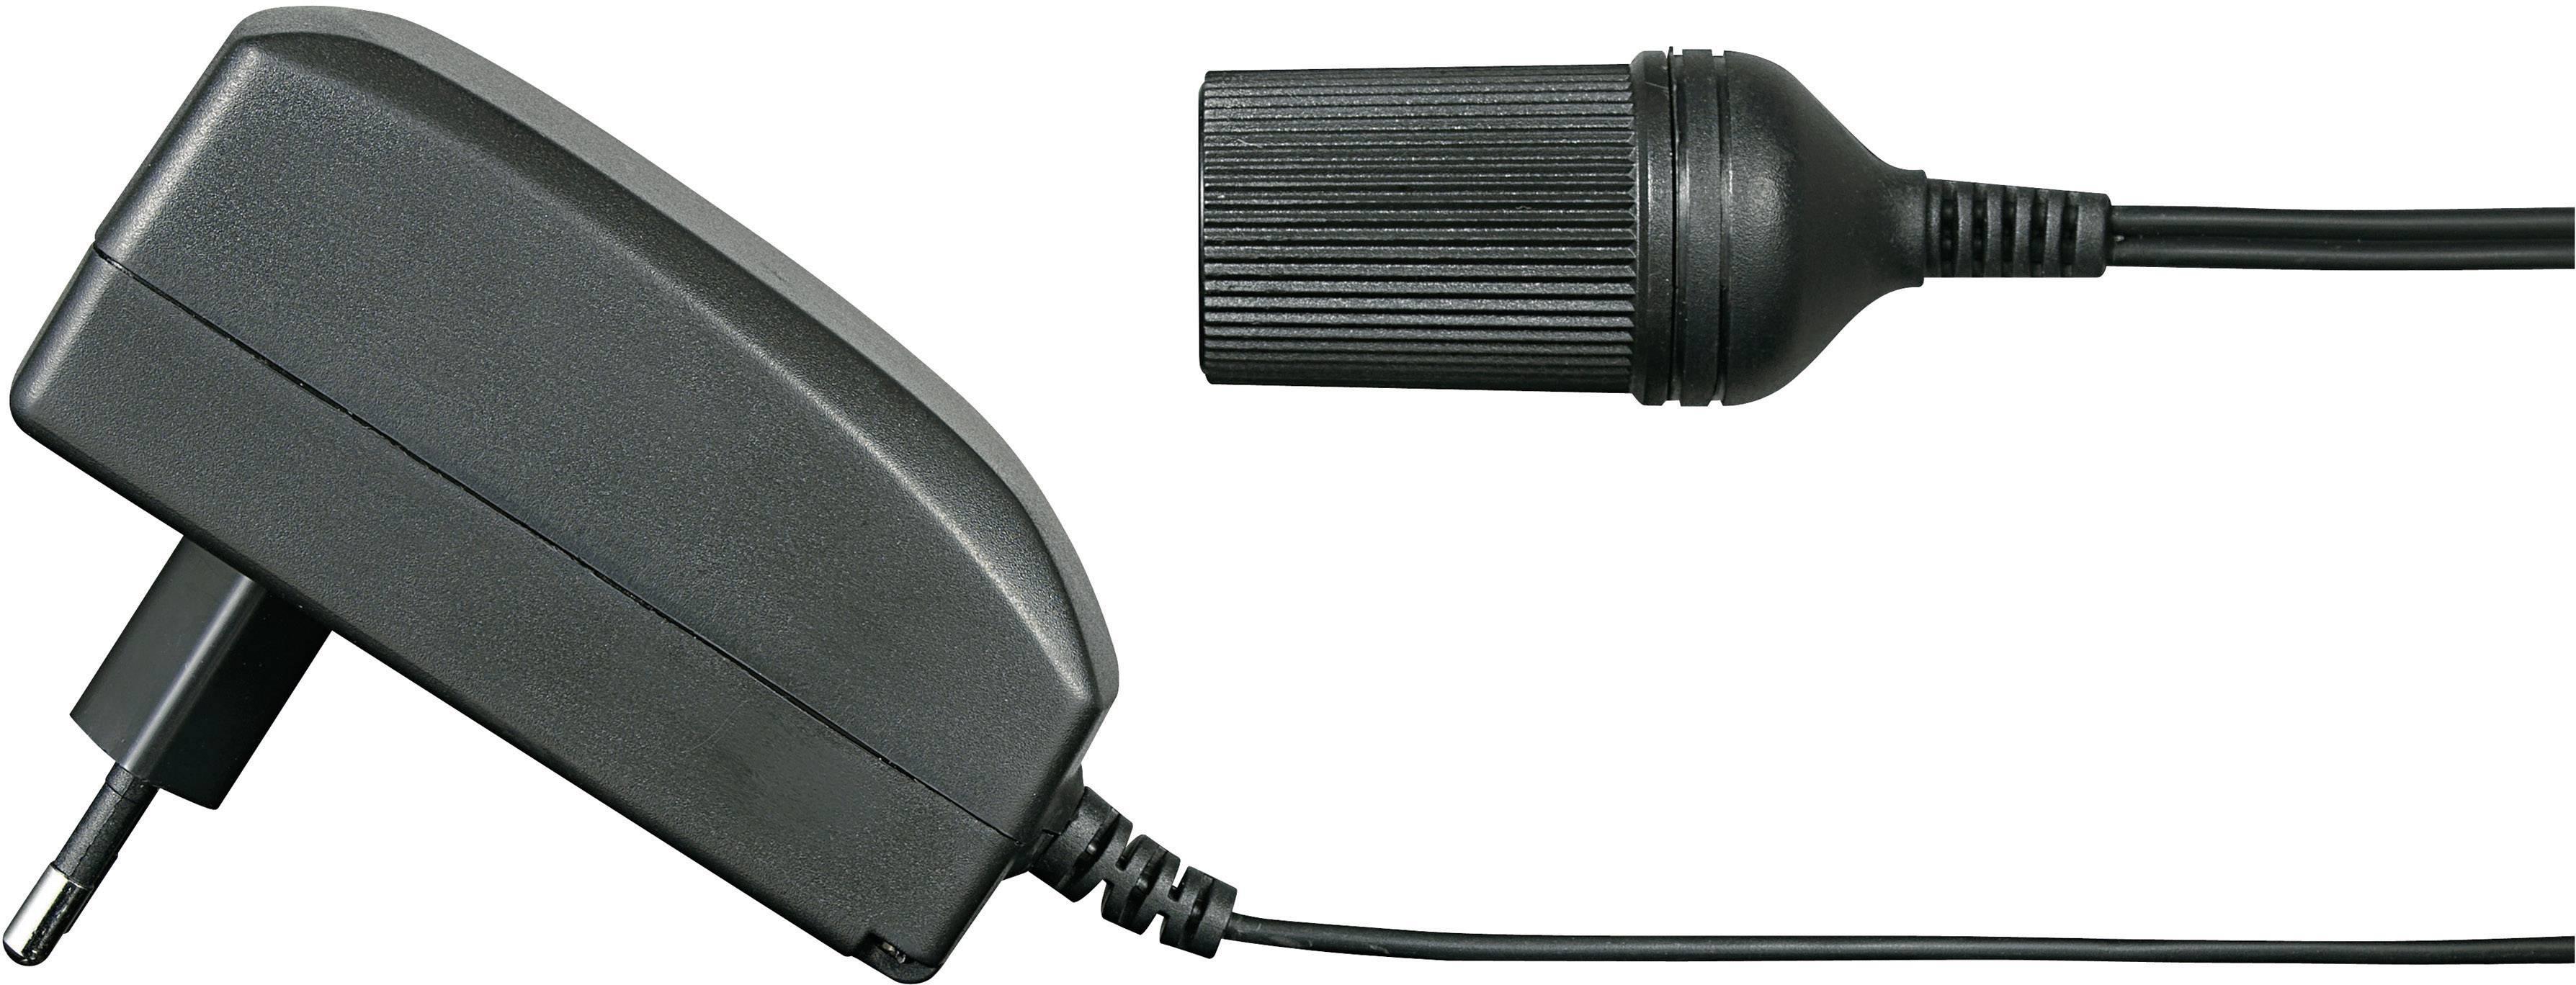 Síťový adaptér s konektorem doauta Voltcraft, FPPS 12-27W, 12 V/DC, 27 W